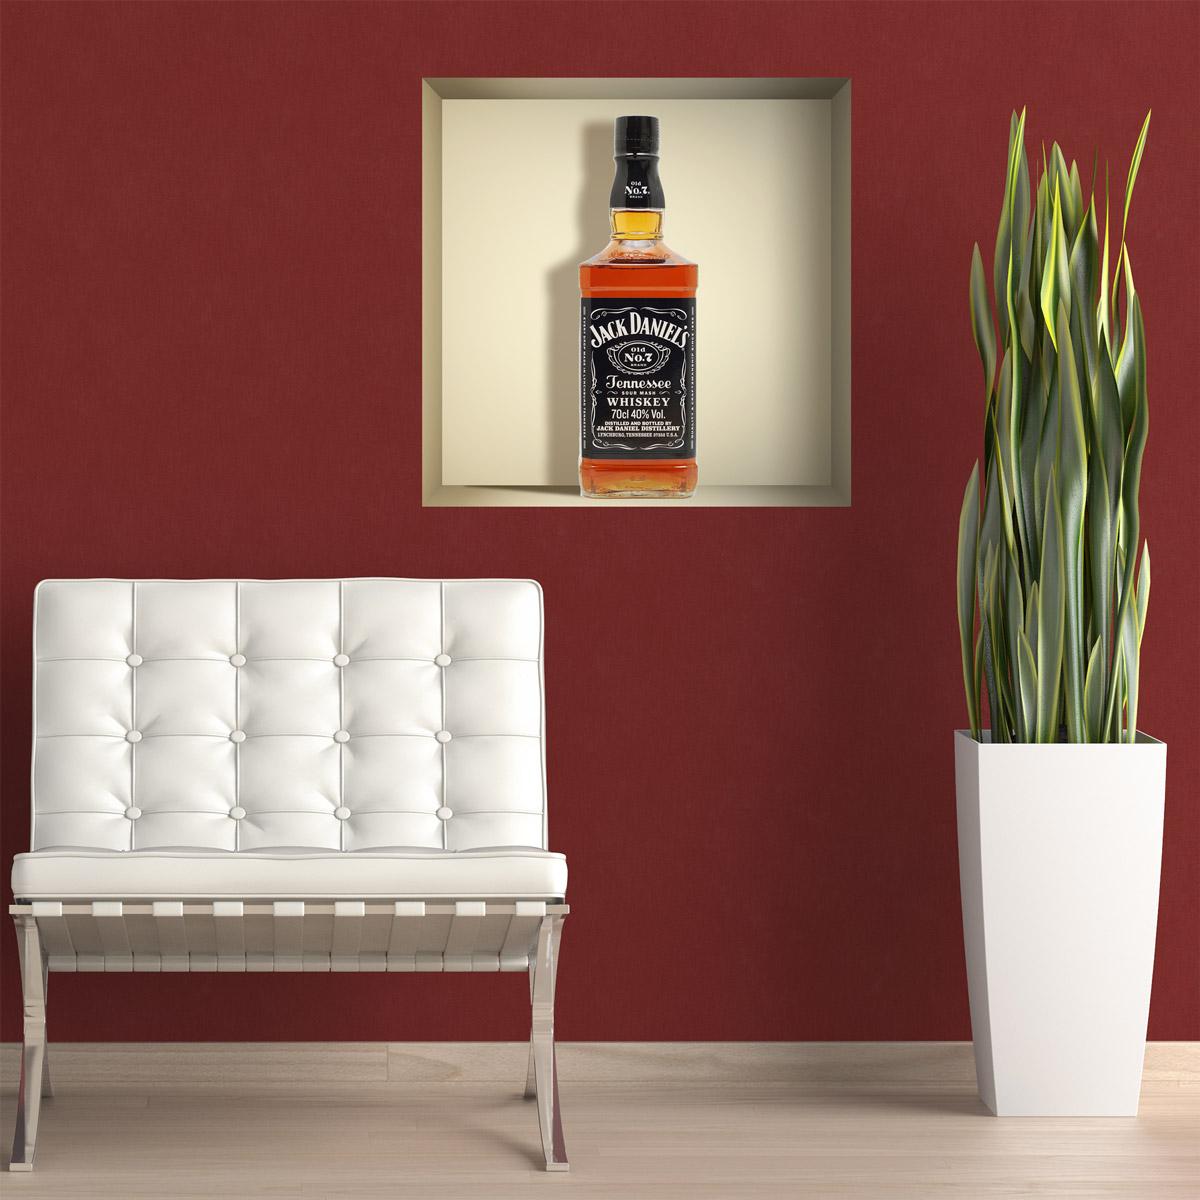 Novedad nicho decorativo botella Jack Daniels